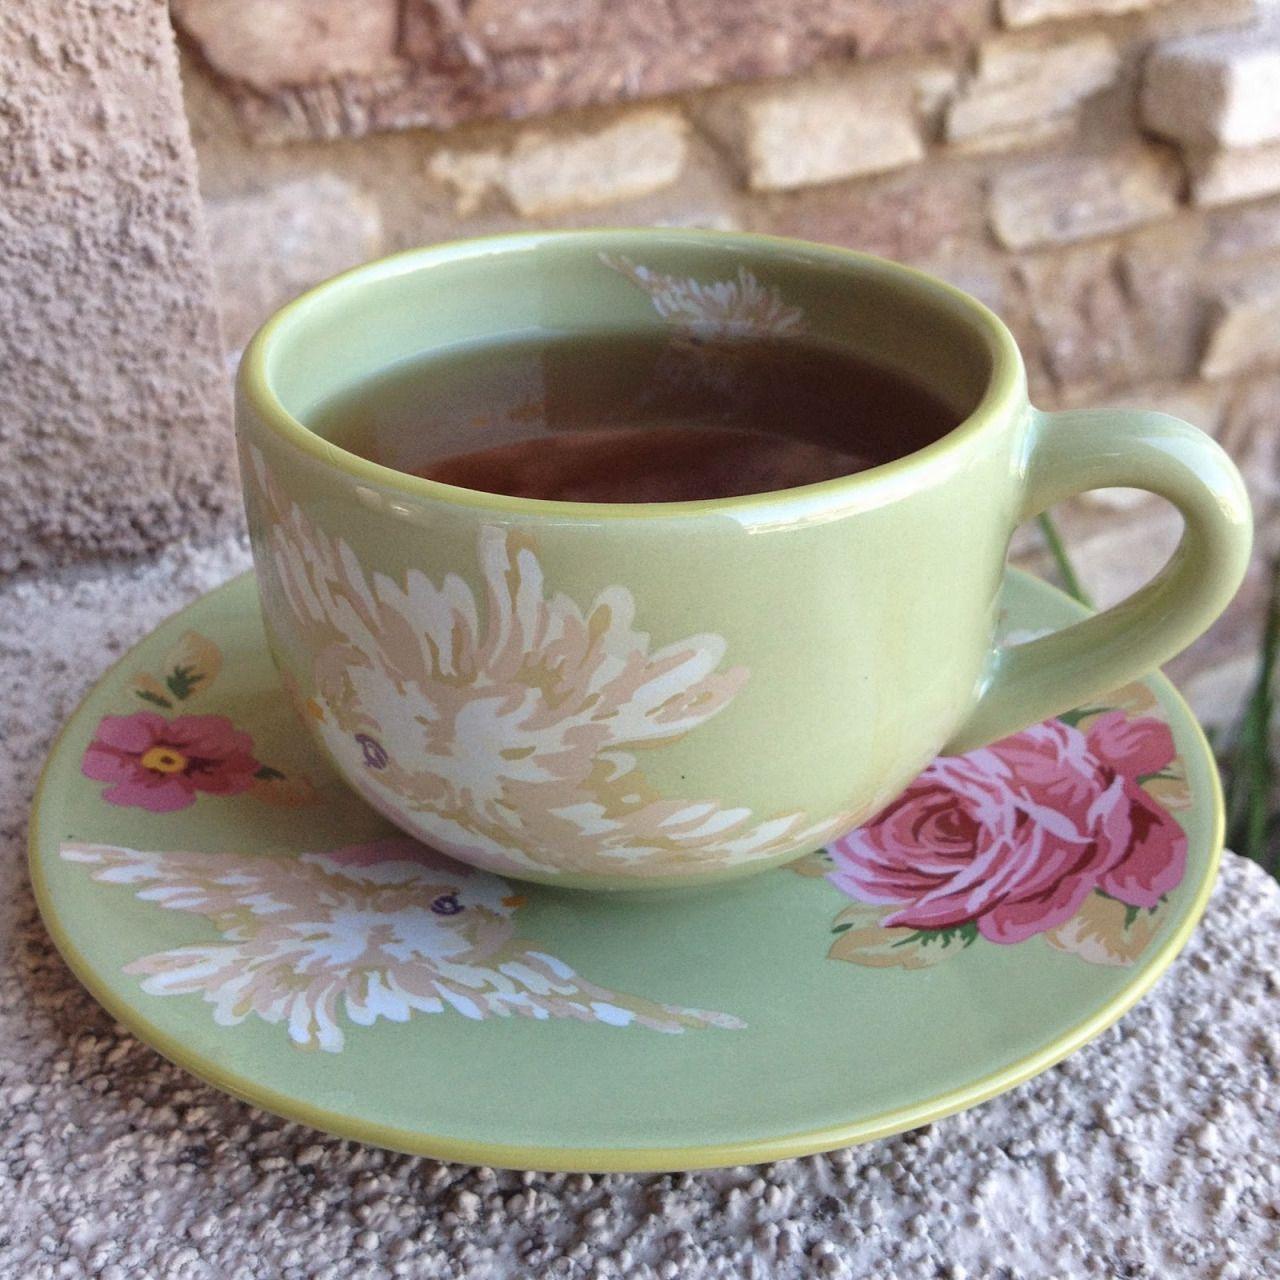 Pin by marilyn on crockery tea tea cups sweet tea